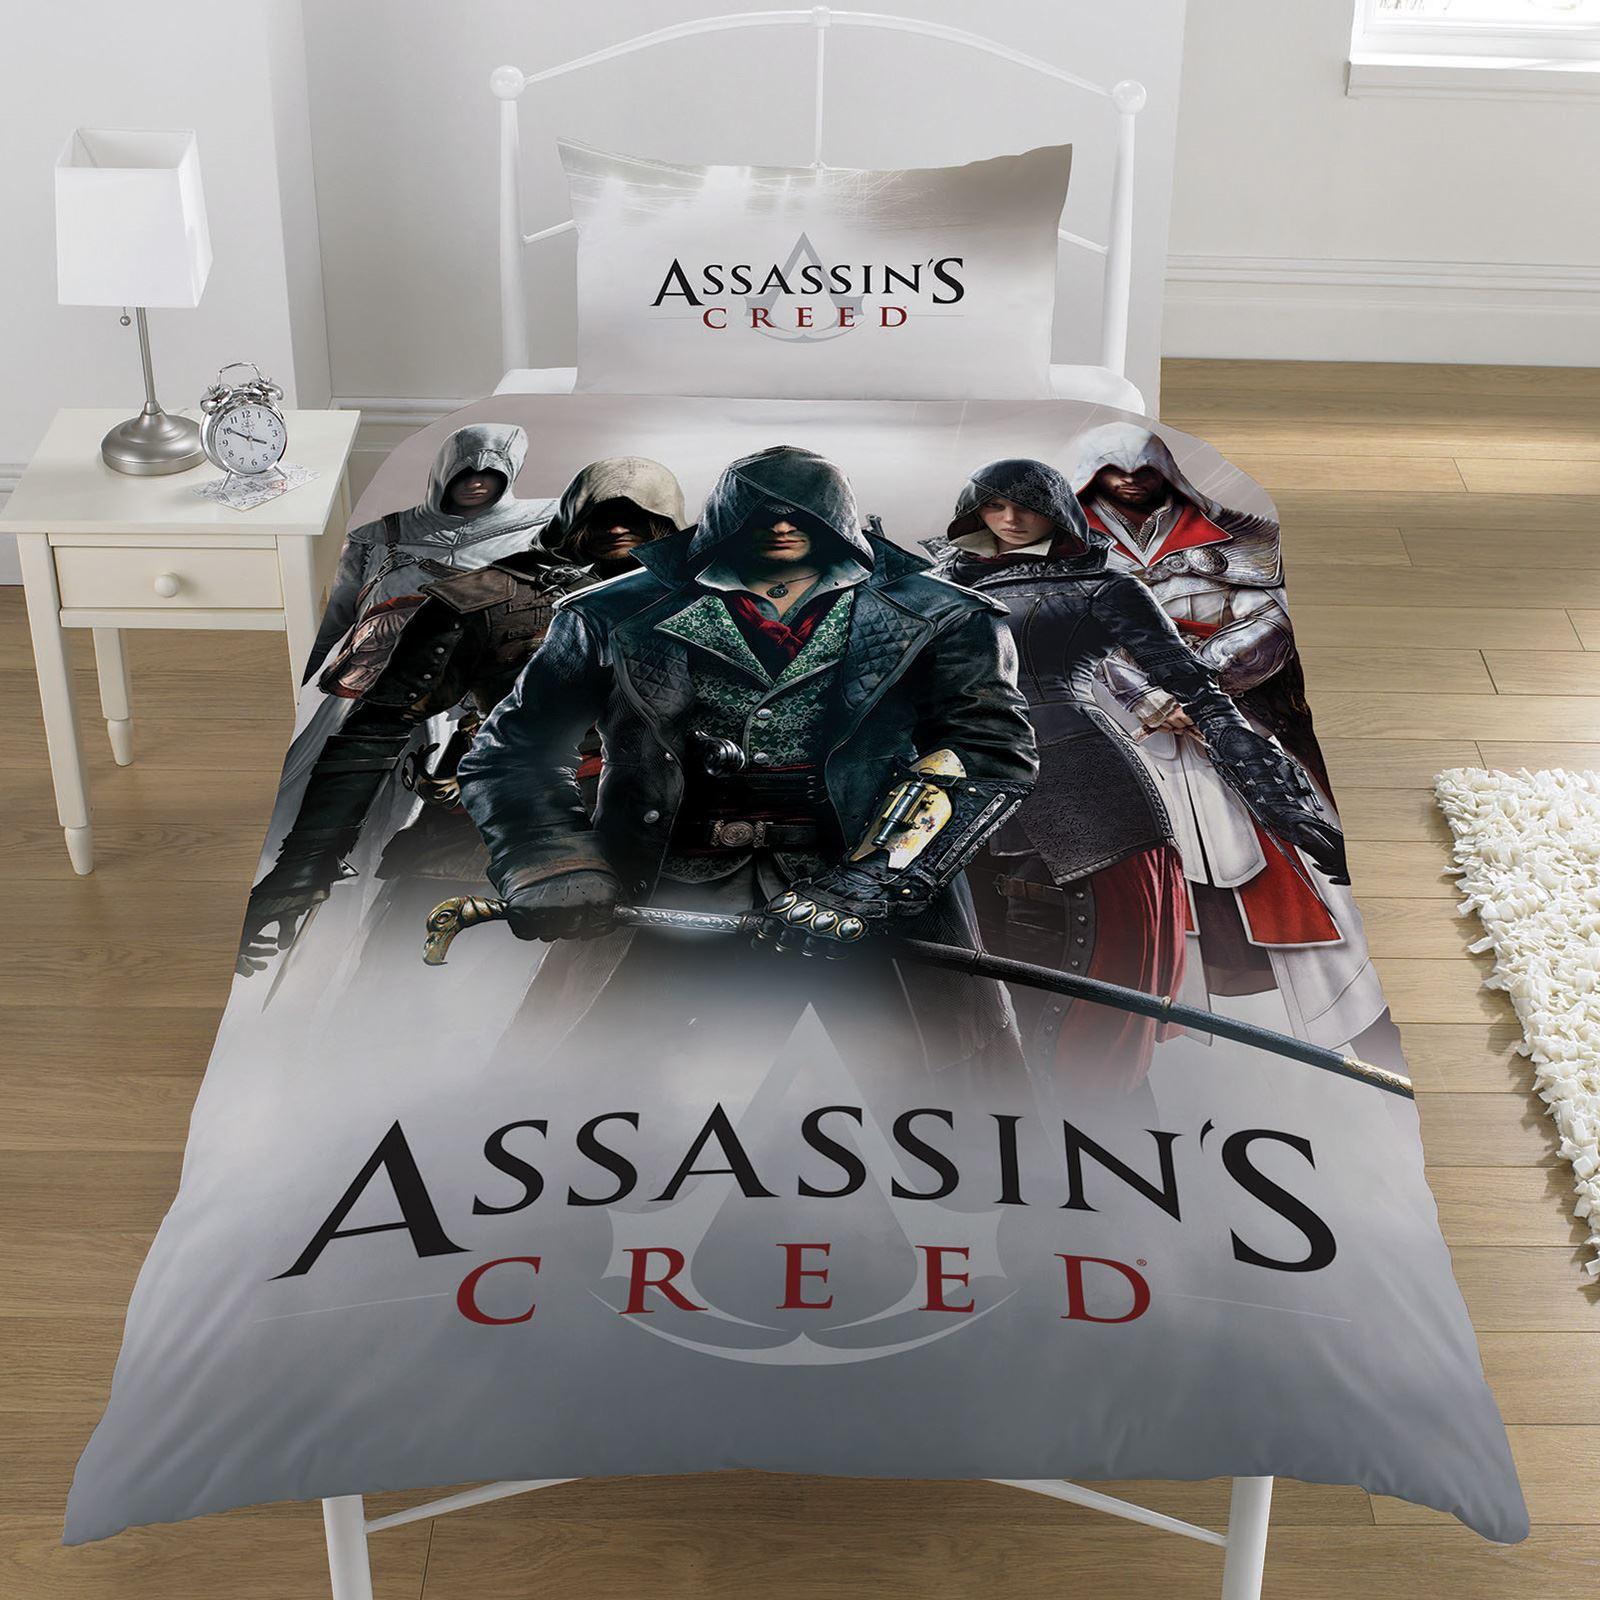 Assassins Creed Duvet Cover Sets Various Designs Boys Bedding Reversible 2 In 1 Ebay